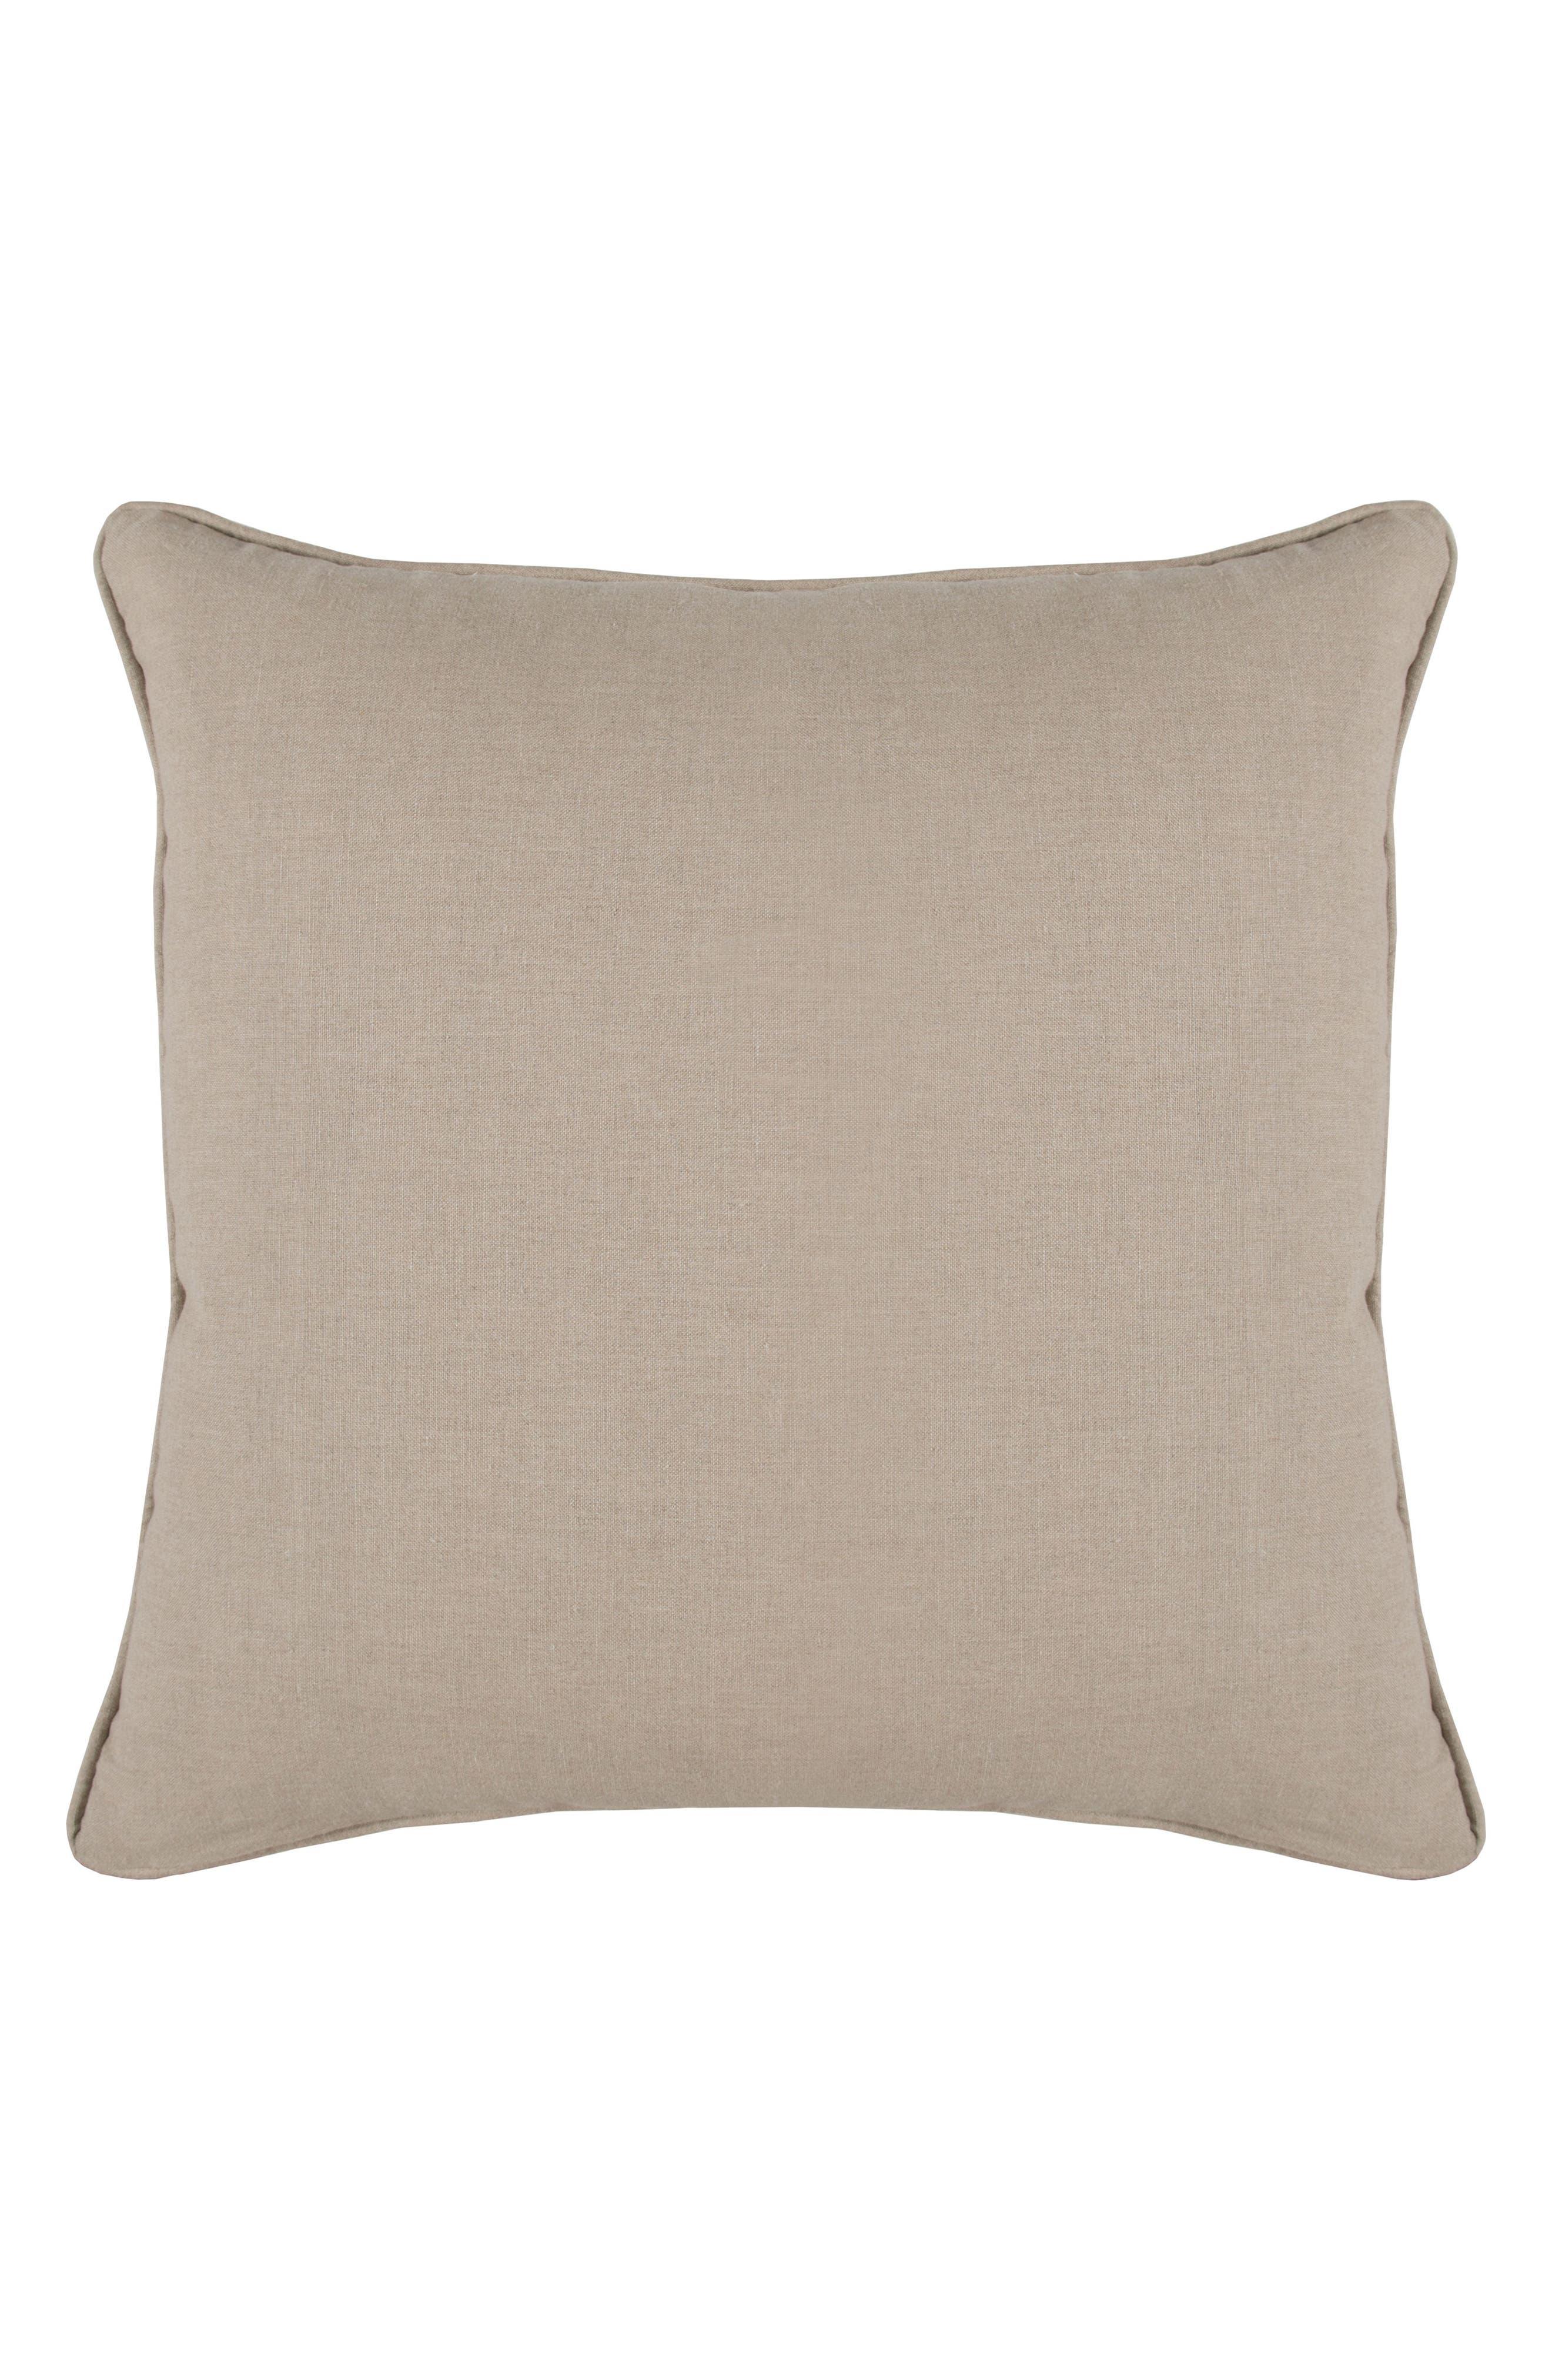 Luri Accent Pillow,                             Alternate thumbnail 2, color,                             Natural